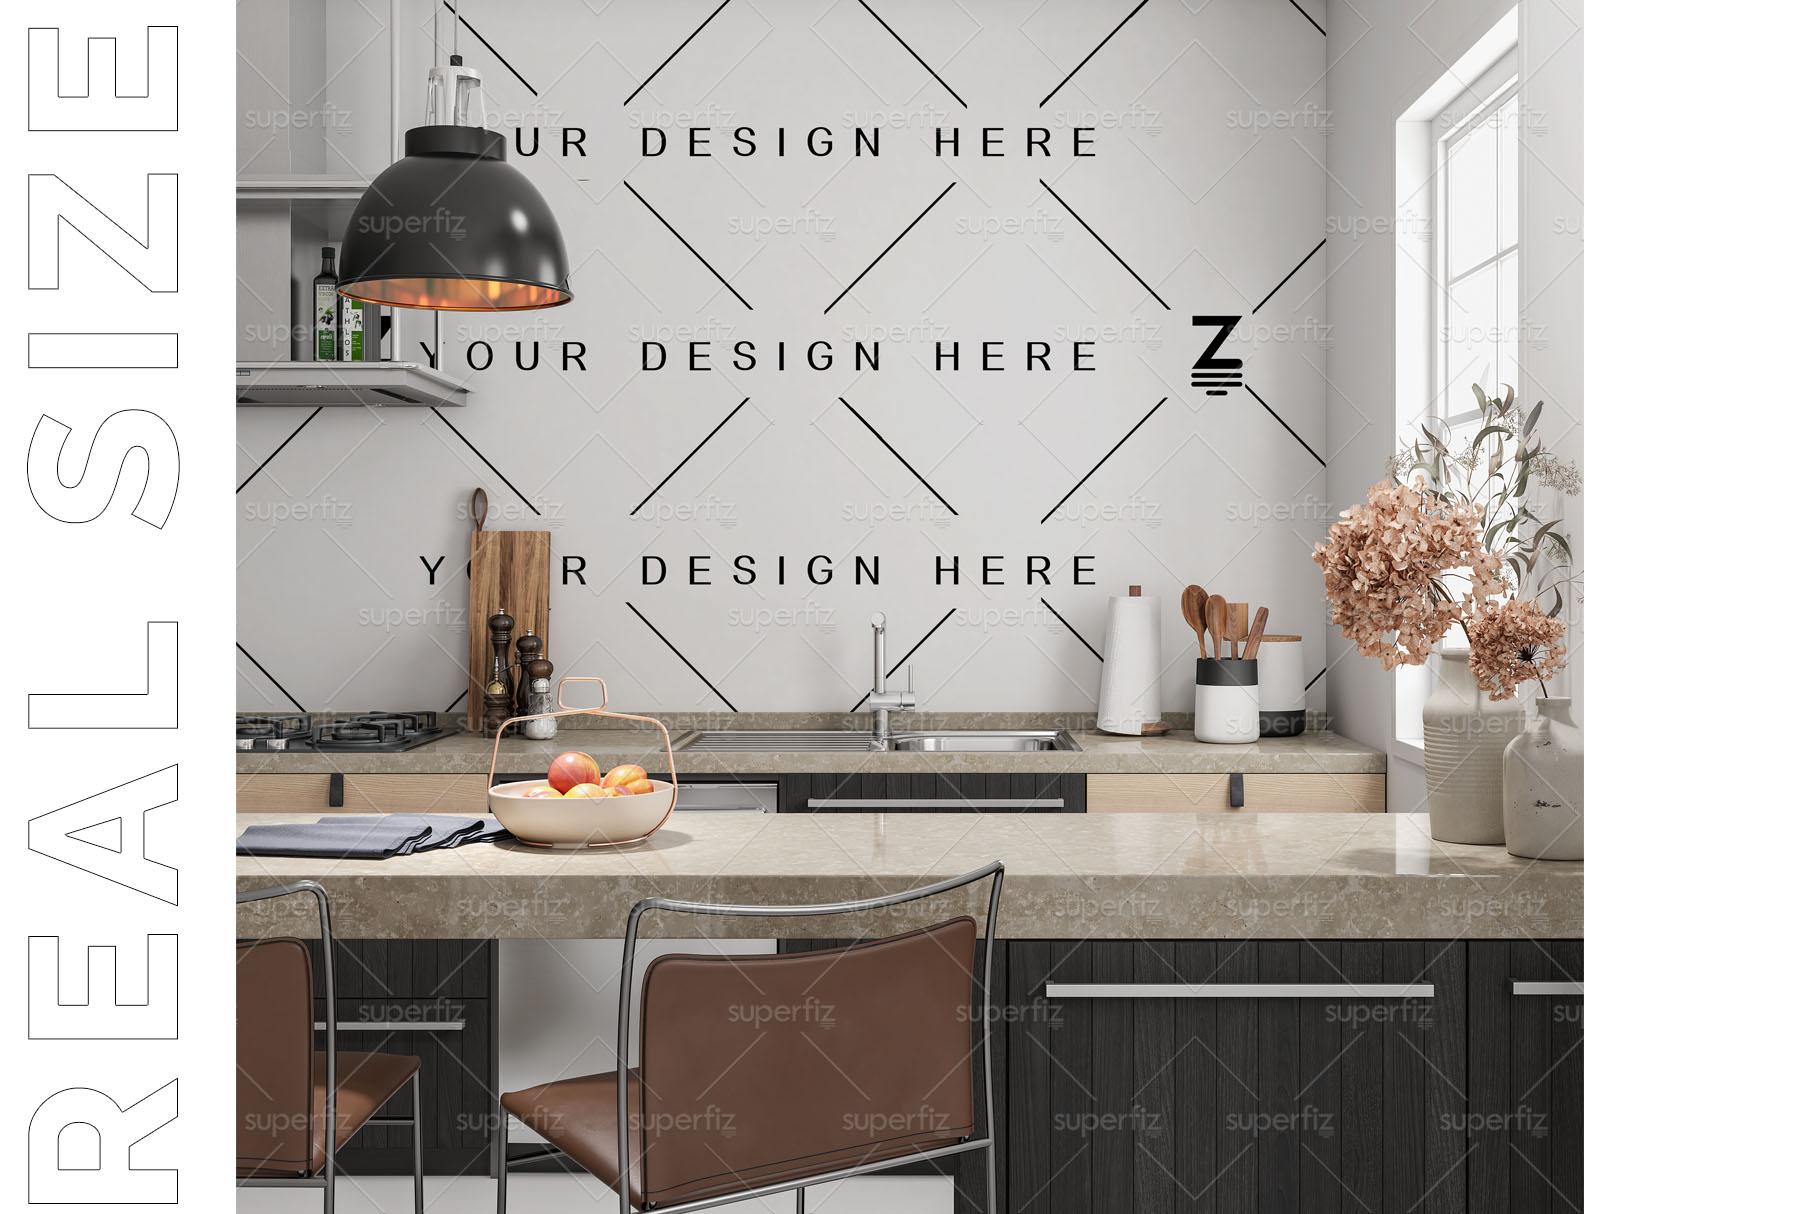 Blank Wall Kitchen PSD Mockup SM73 example image 4